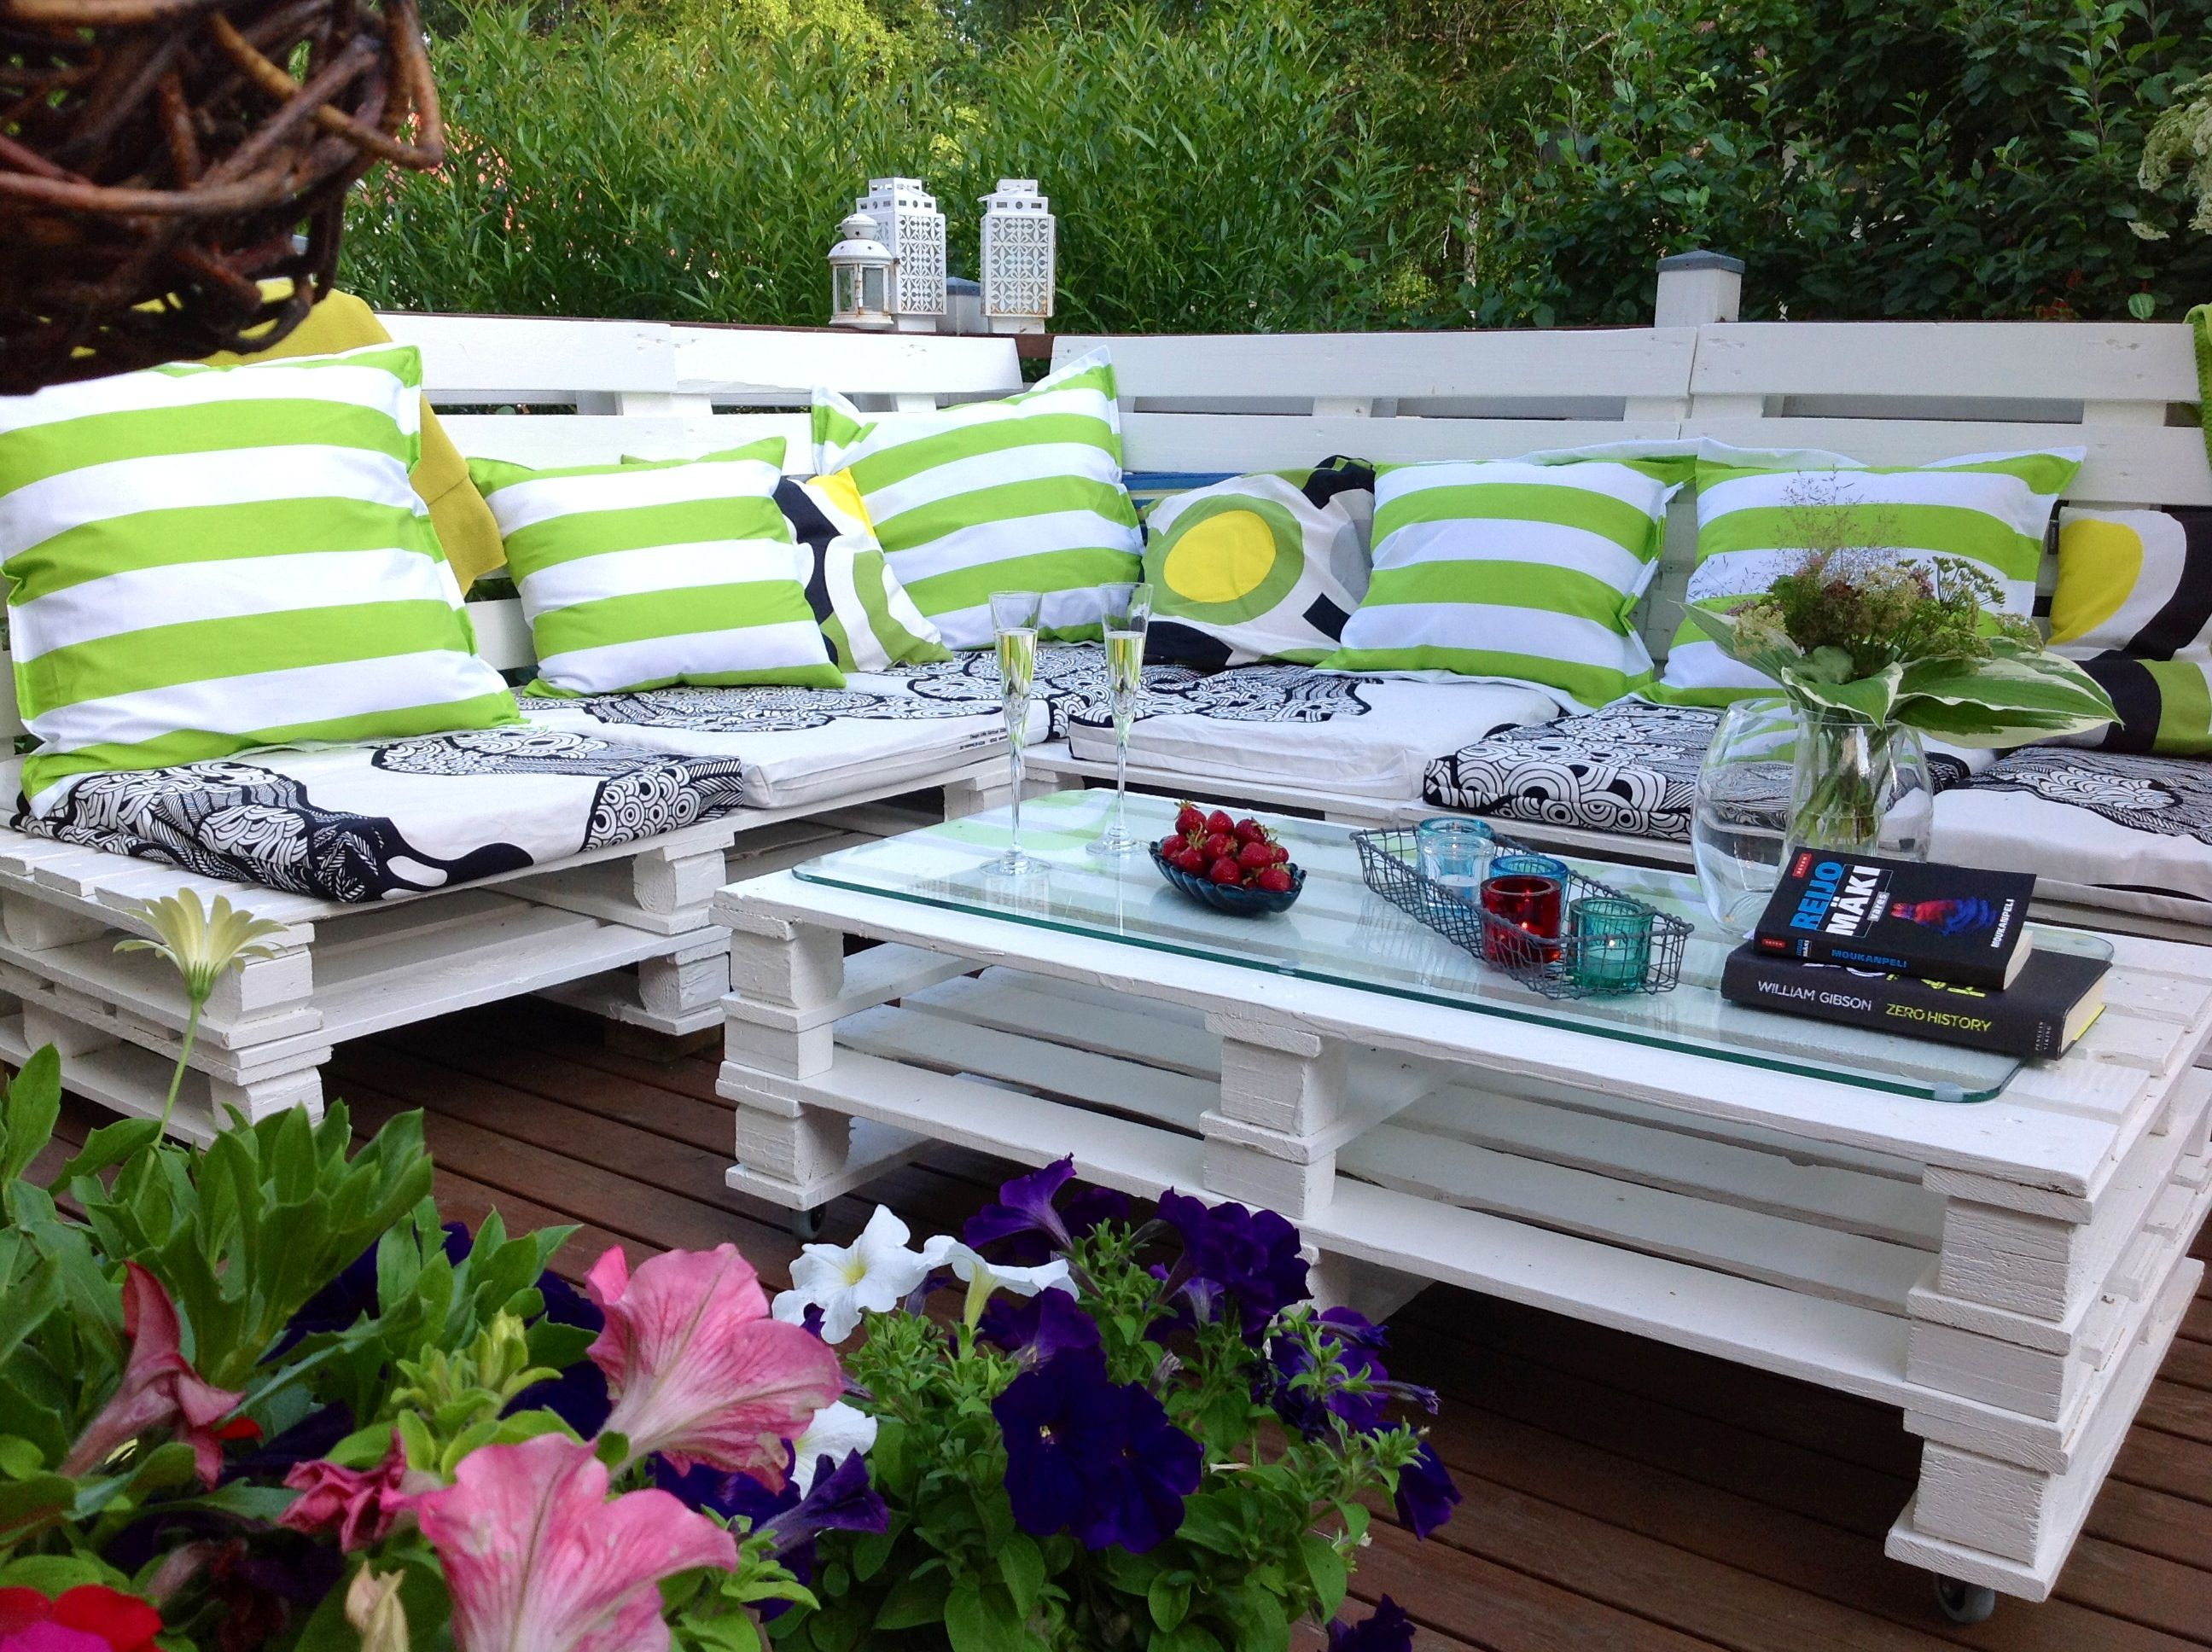 Mobili Da Giardino Con Pallet : Ready outdoor sofa from pallets terassin sohva kuormalavoista